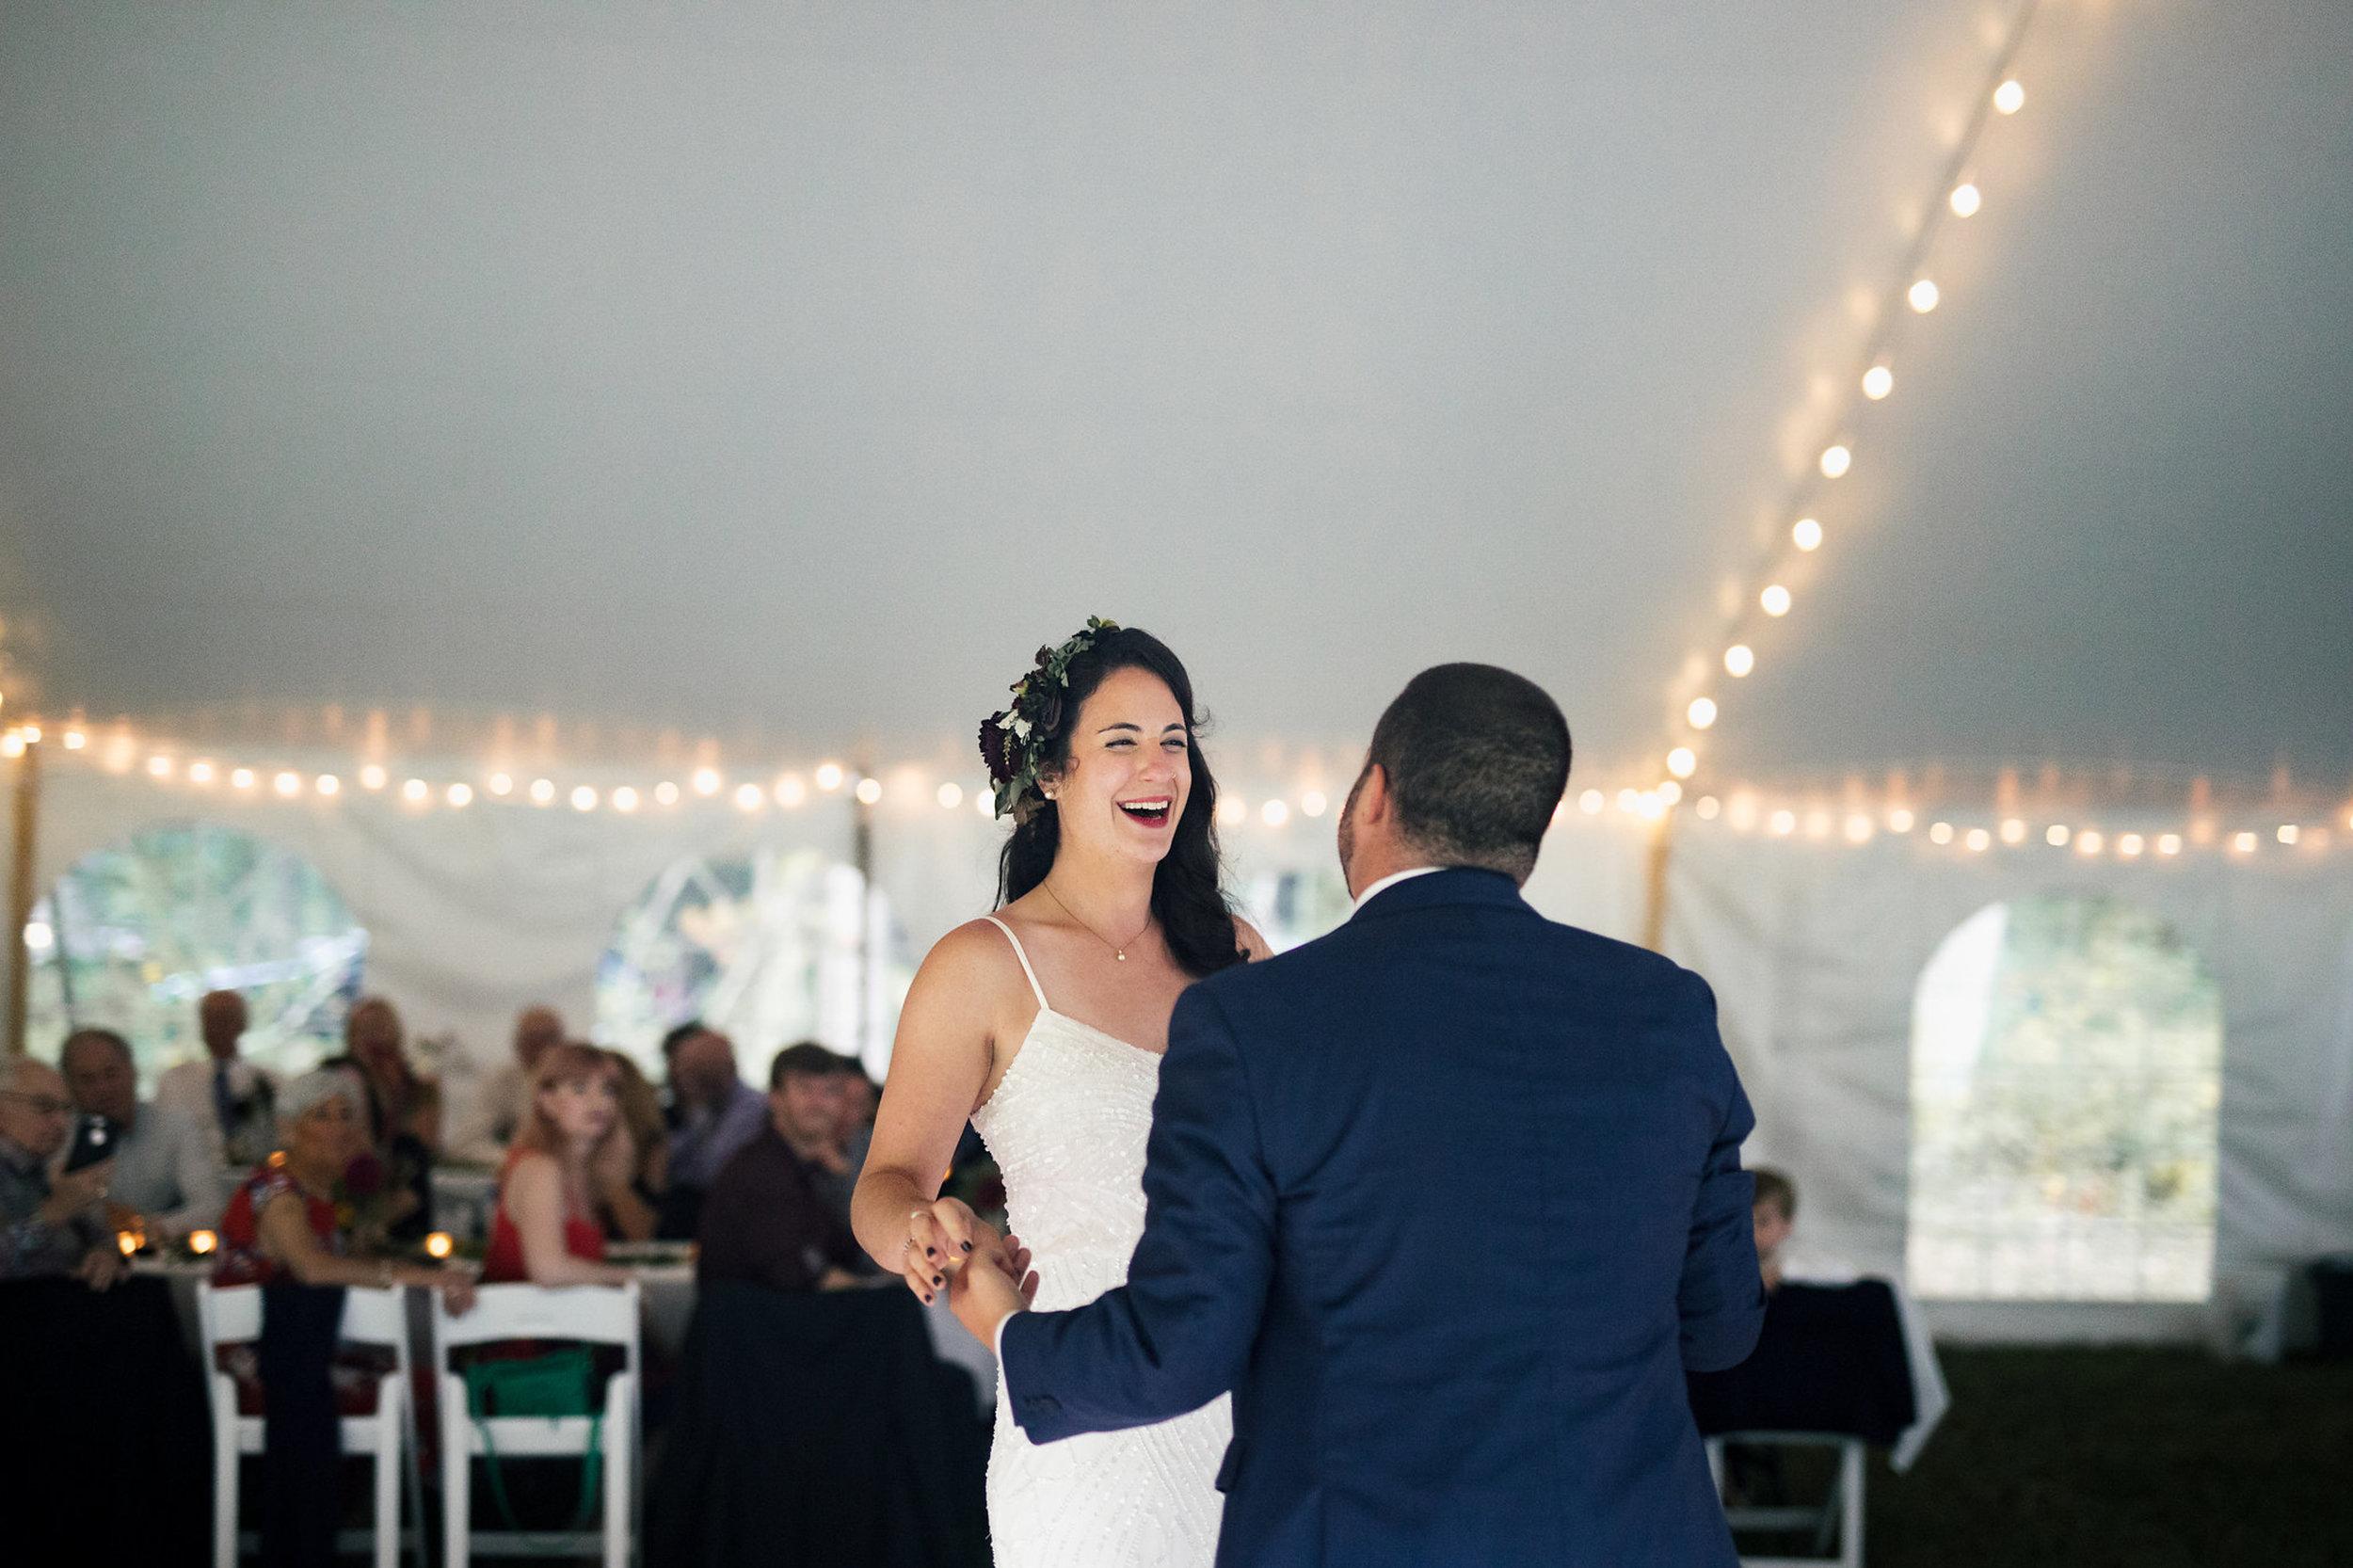 boston_wedding_photographer-105.jpg